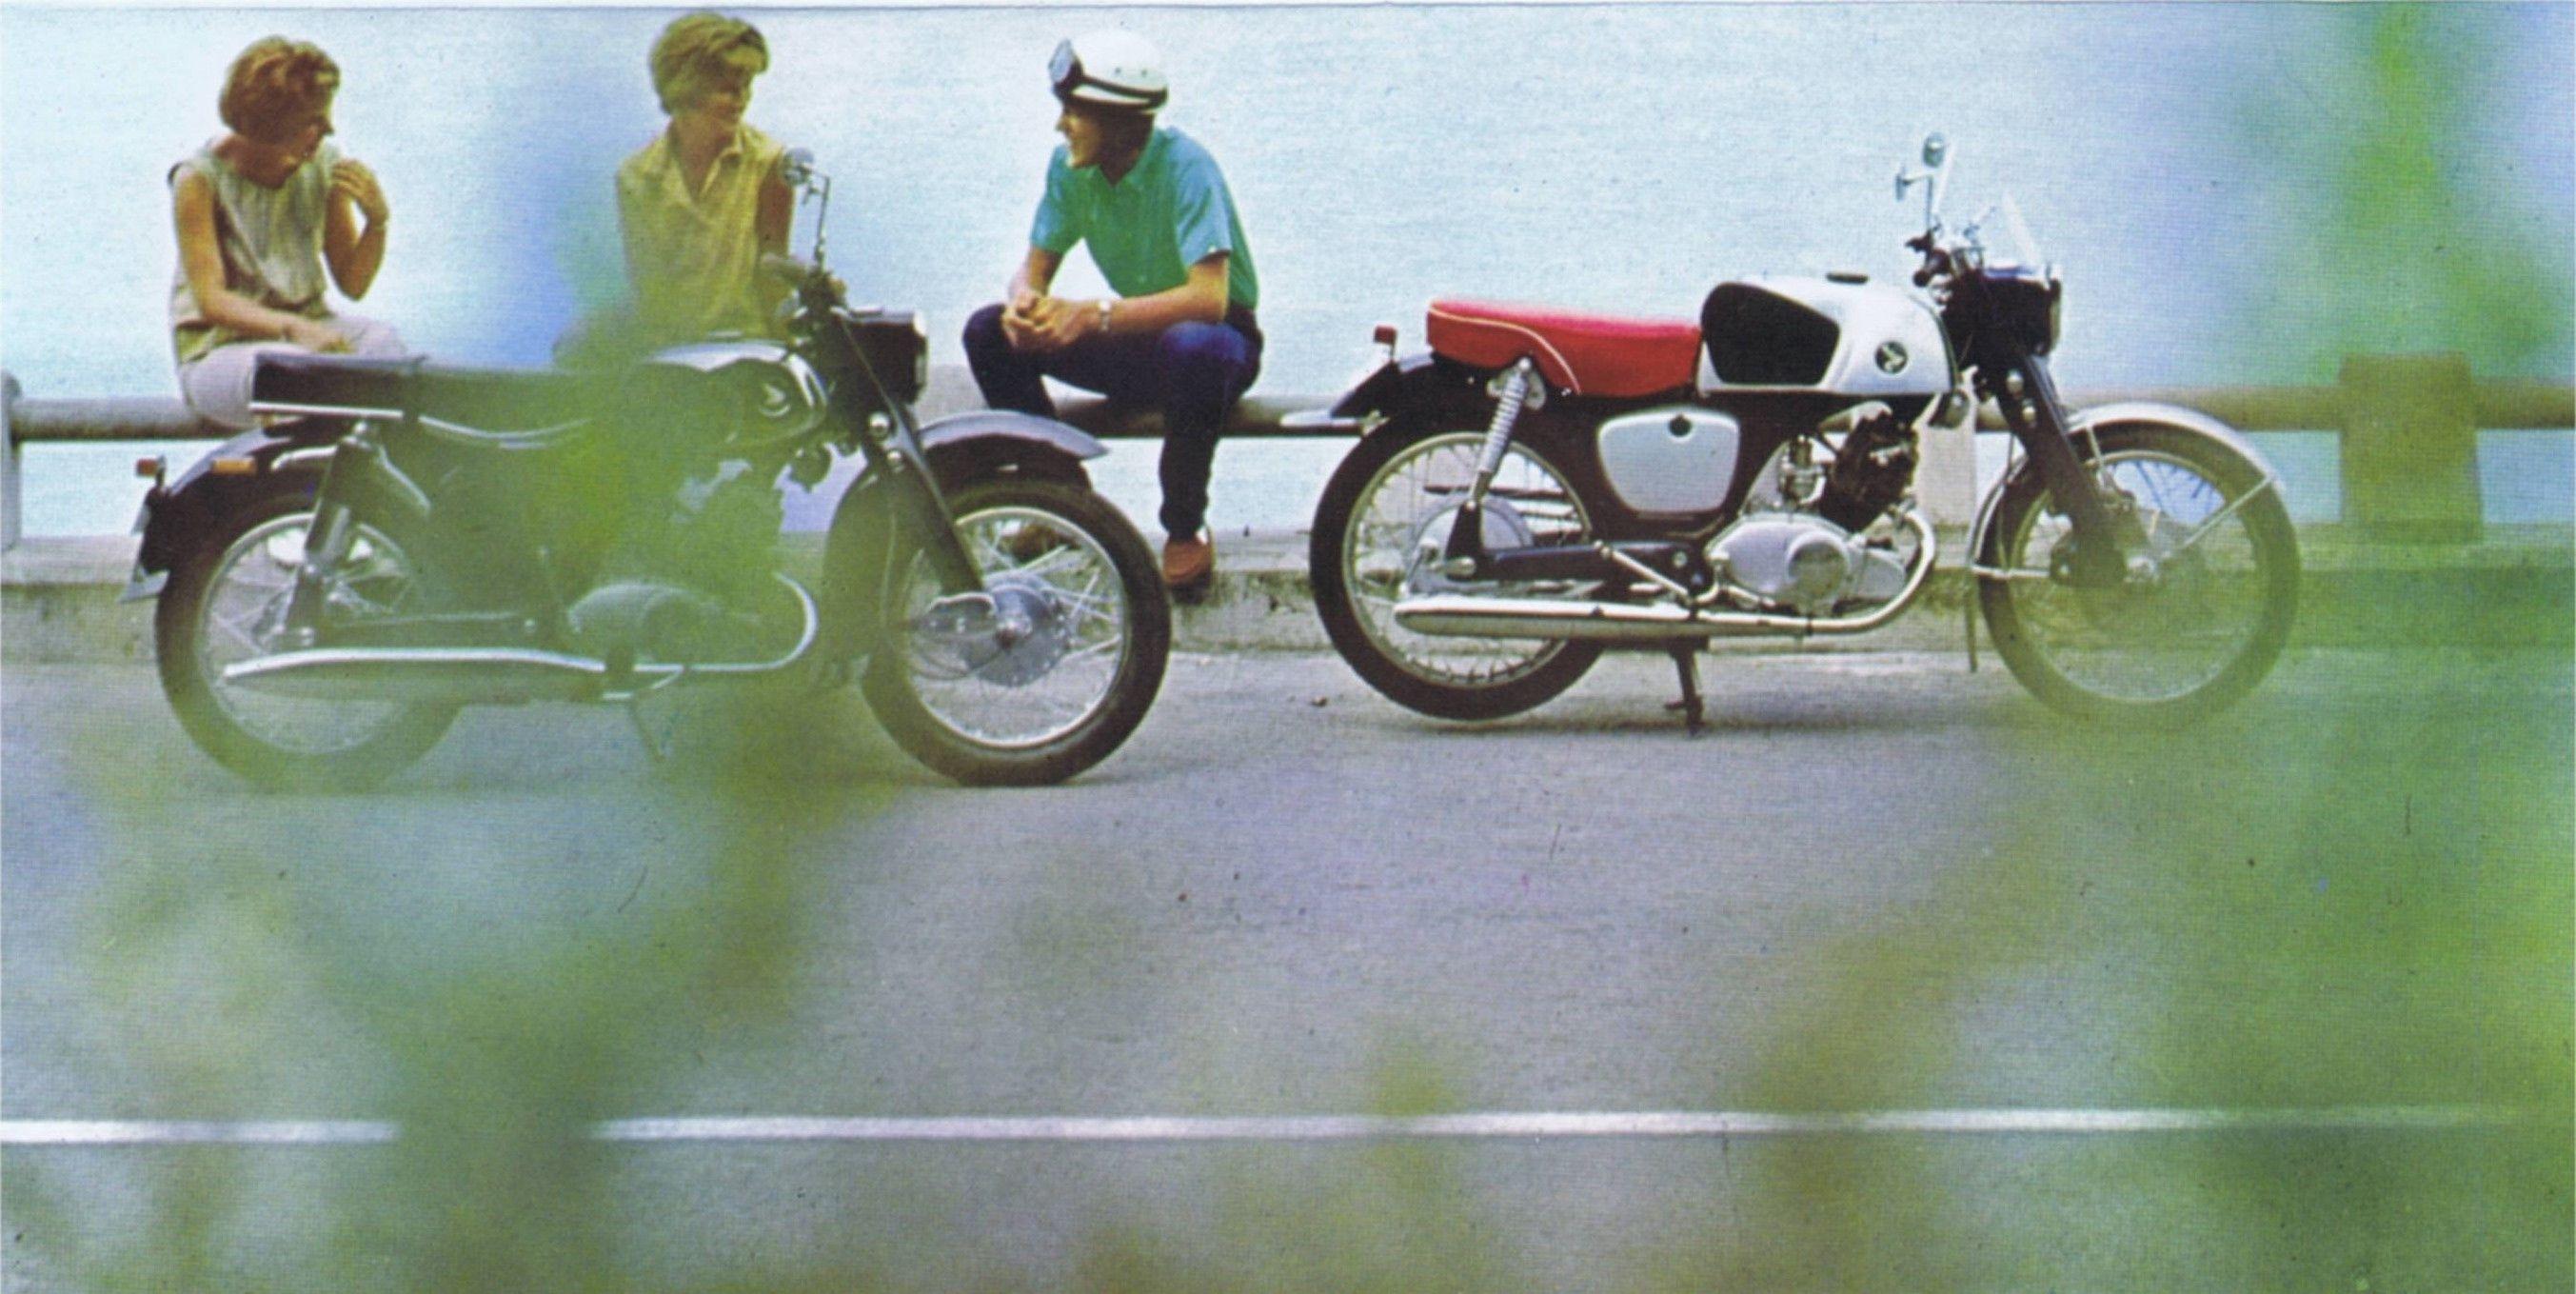 new old stock honda motorcycle parts